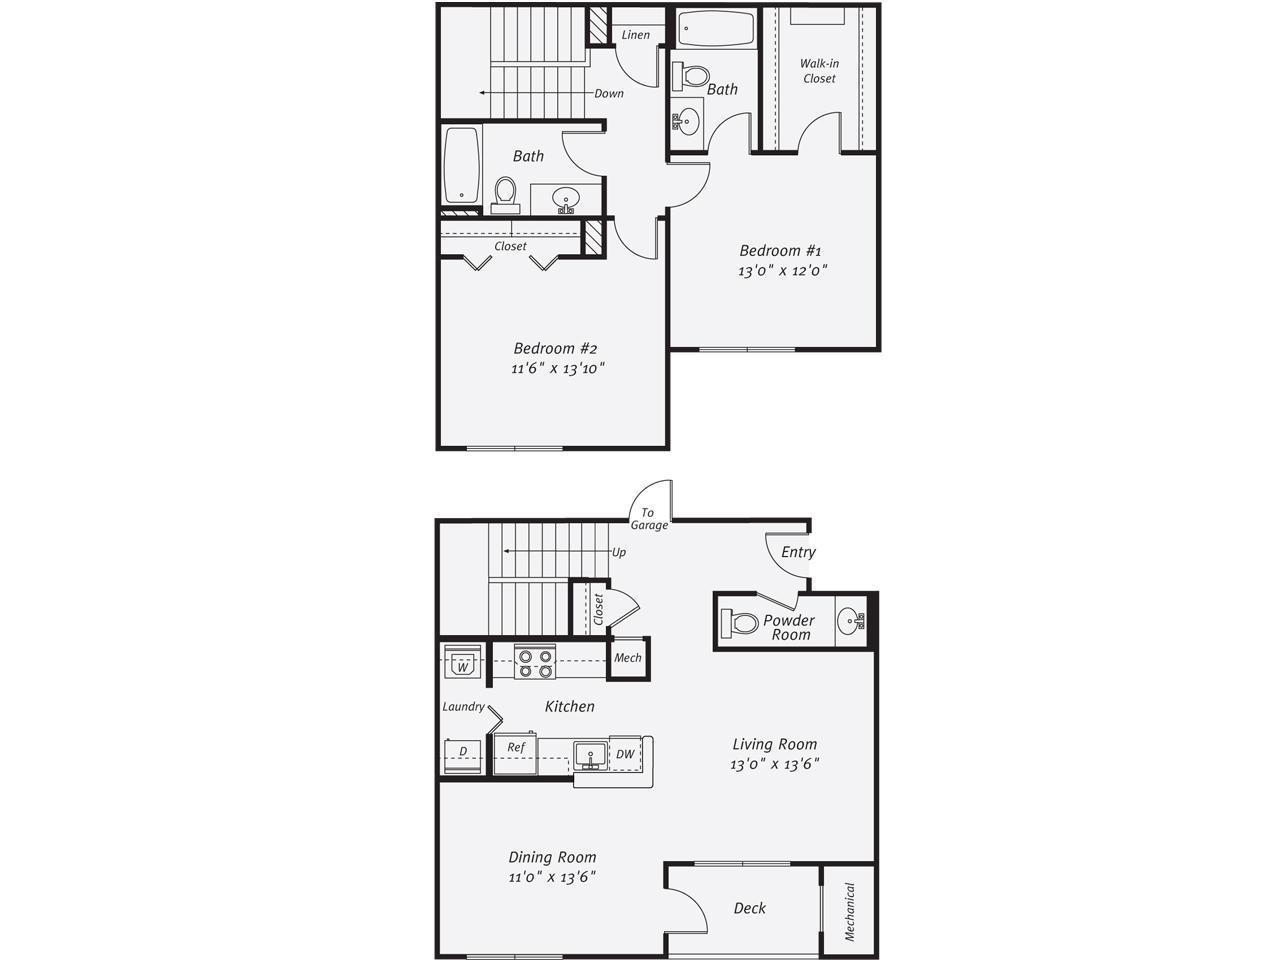 Ny coram thepointatpineridge p0571769 ny014 bt6g 2 floorplan